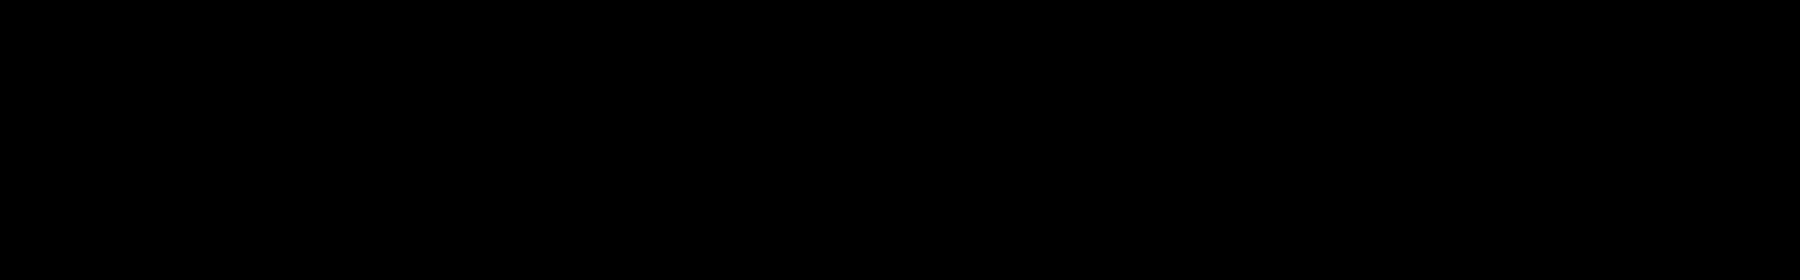 Complextro Bass audio waveform